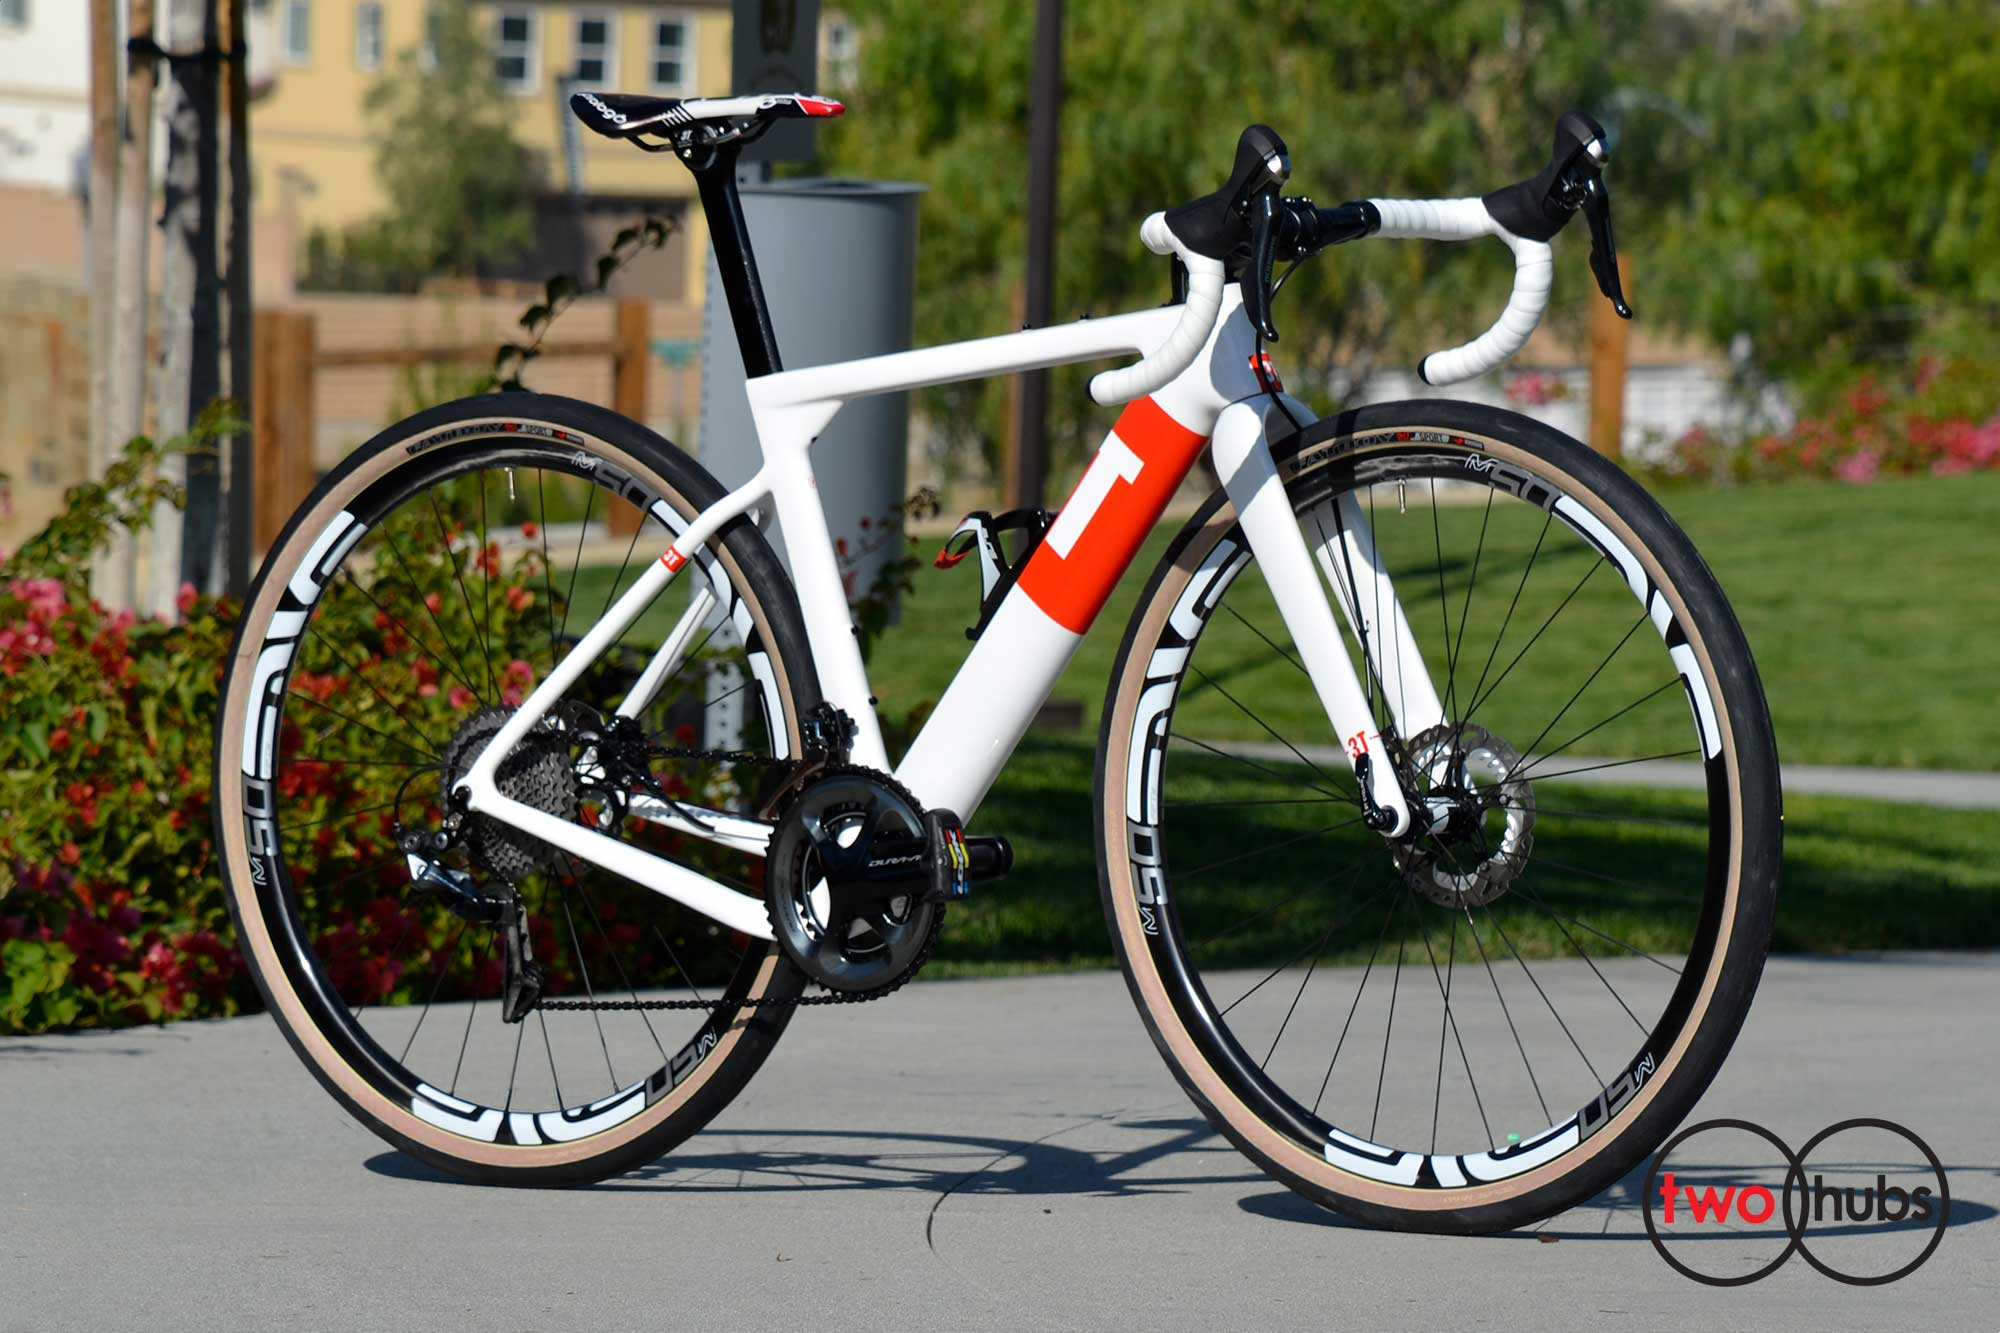 Hey Look A Tt Bike With 29x1 7 Tires Bikeporn